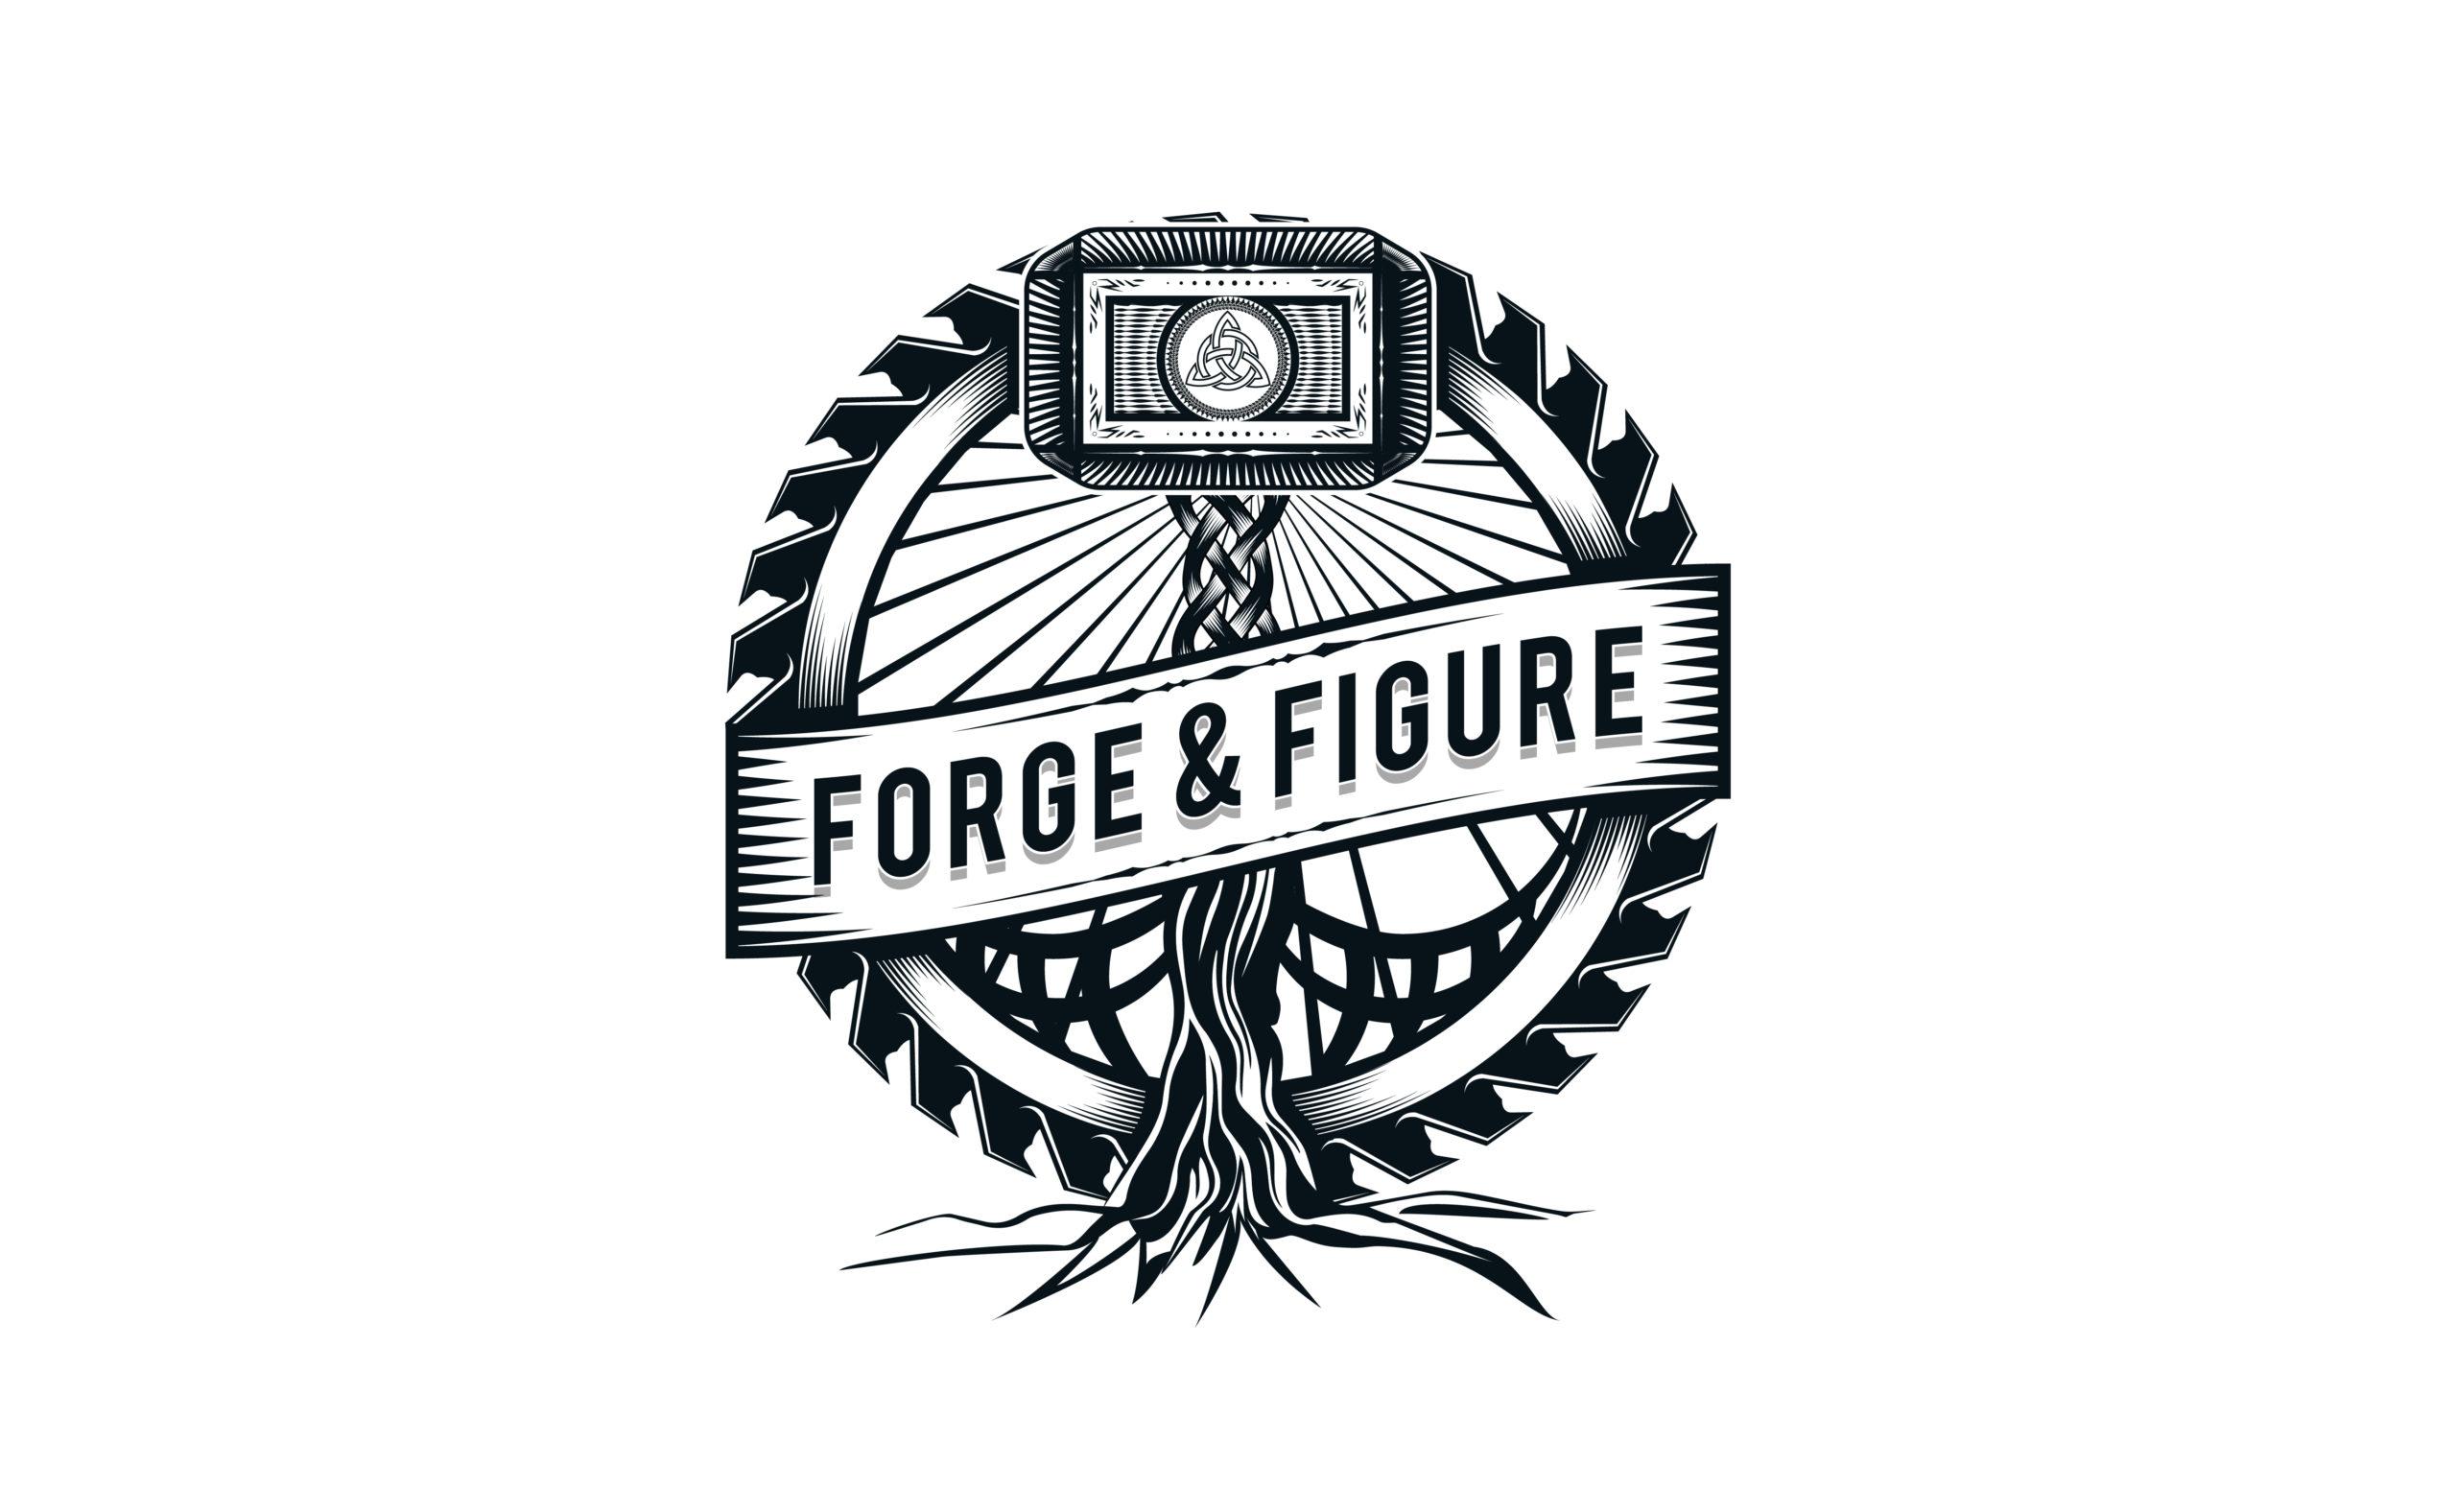 Forge & Figure